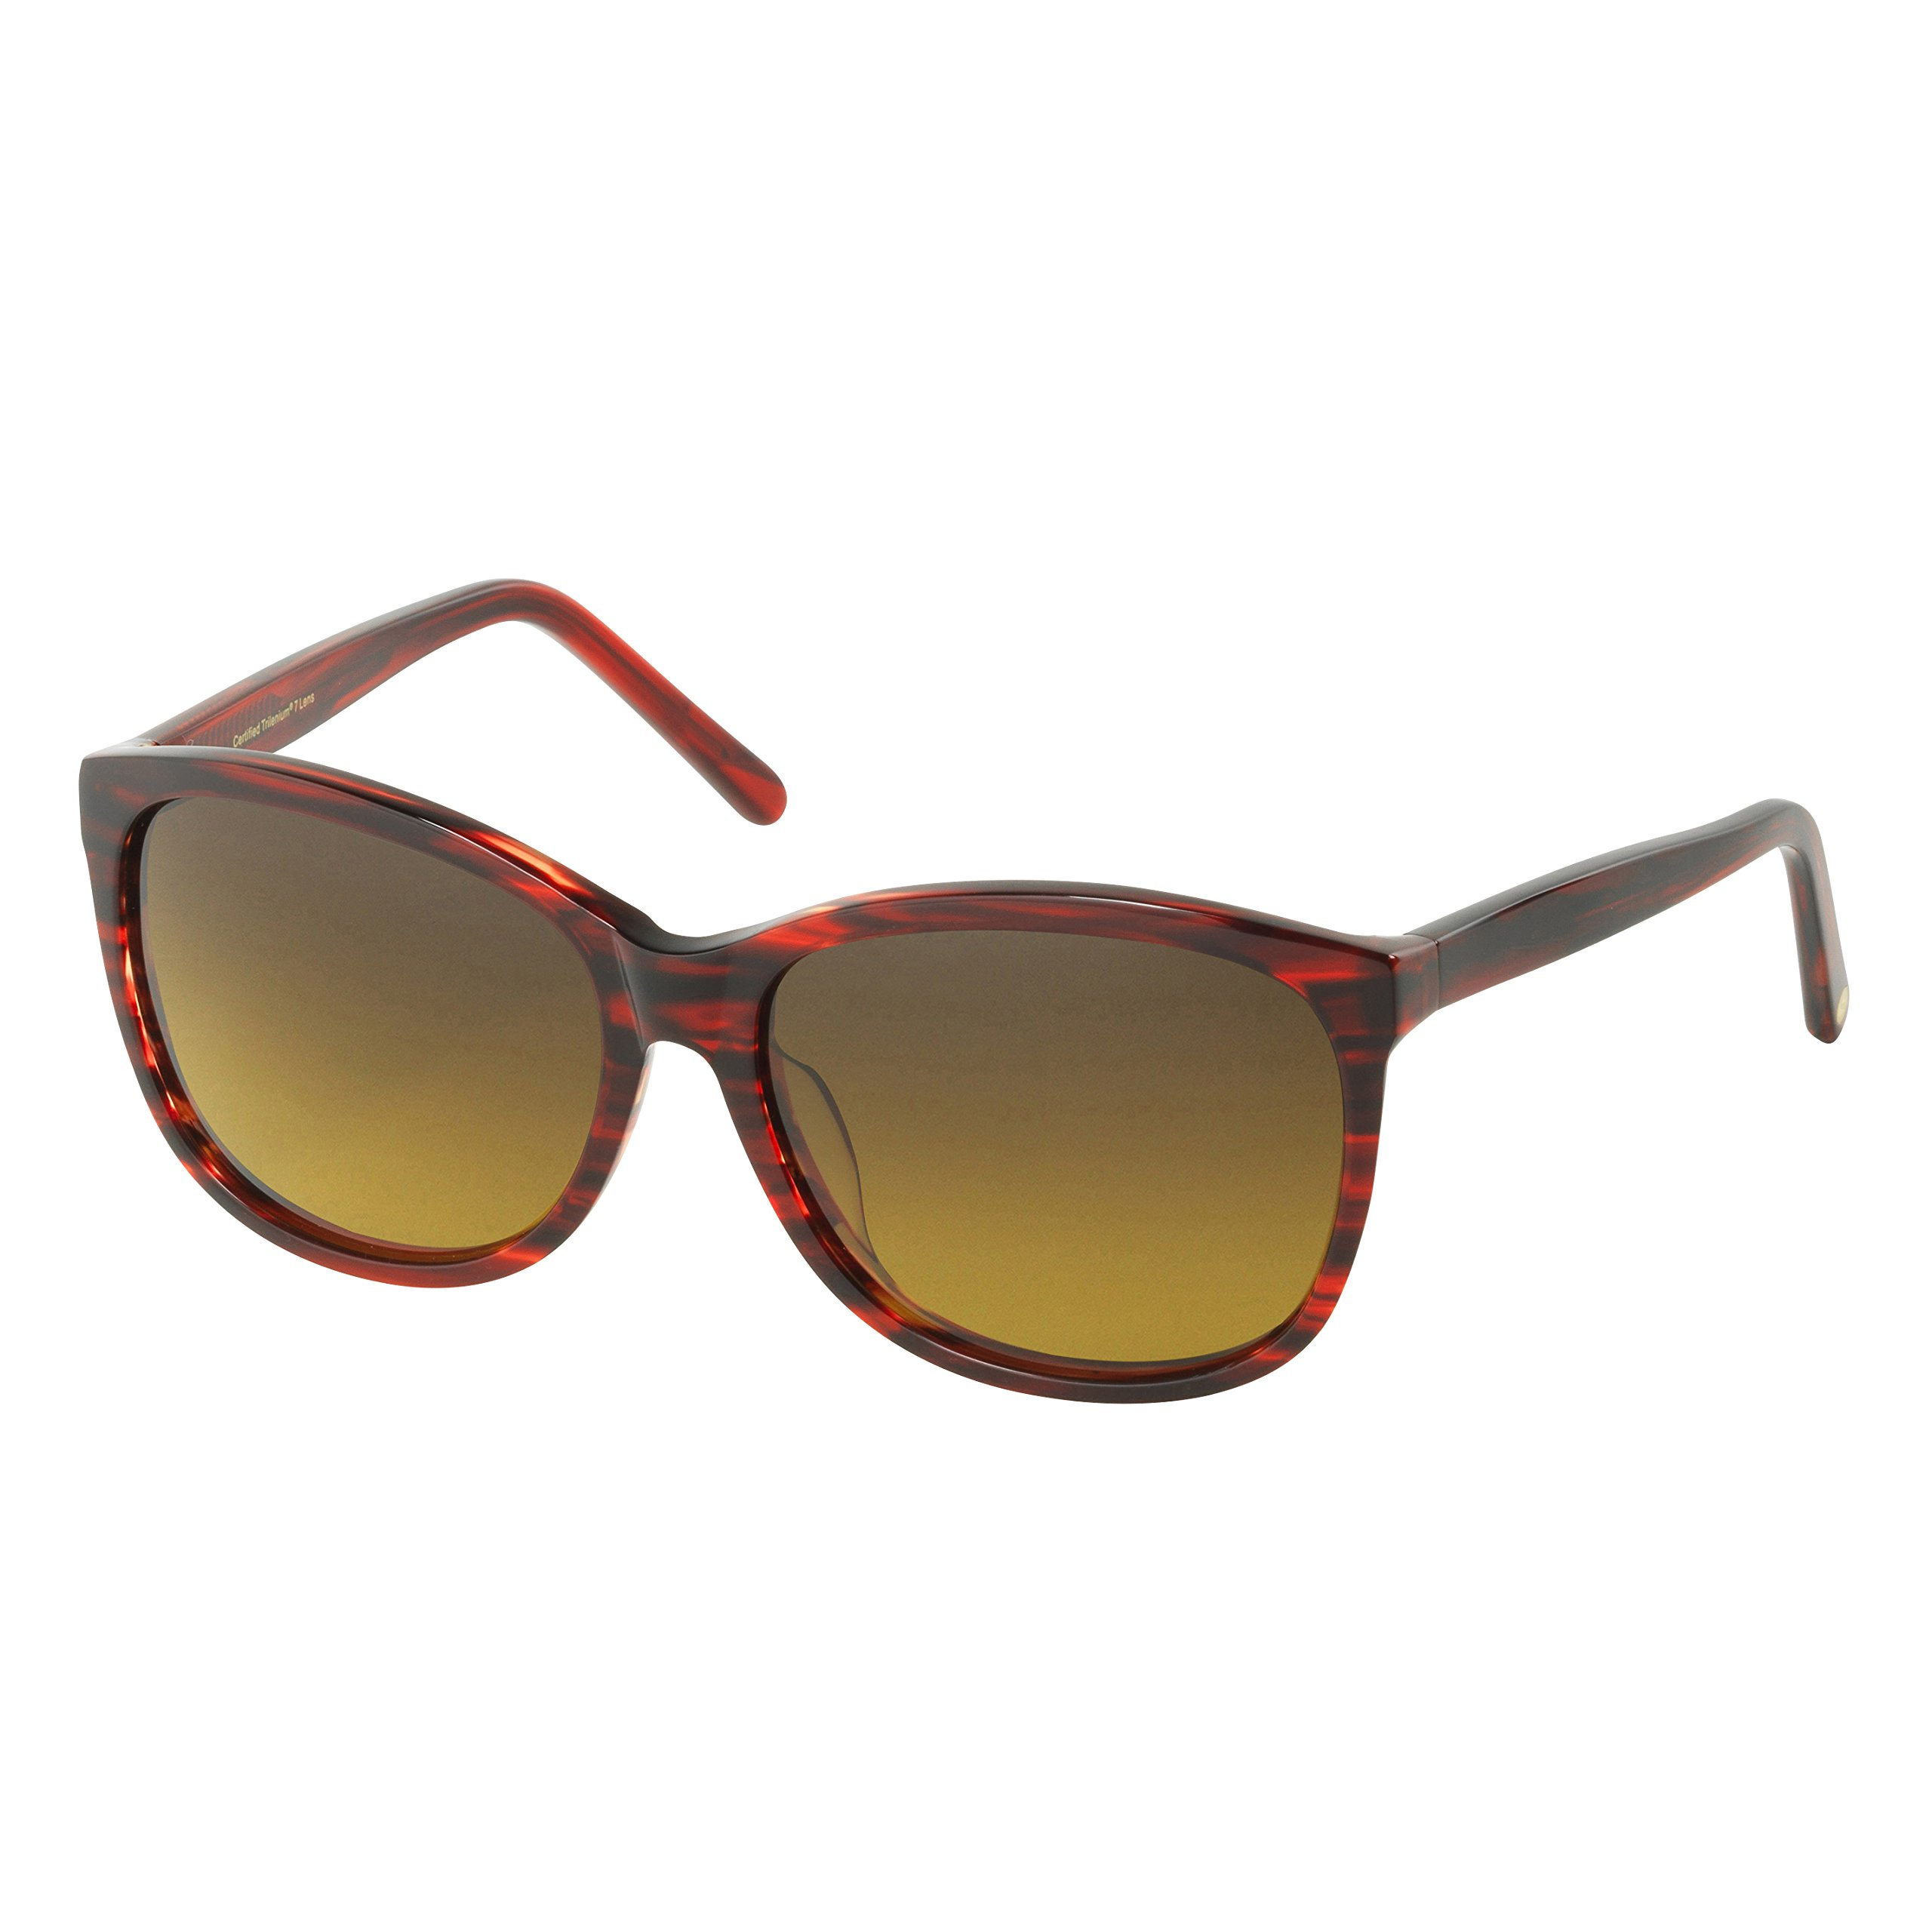 Eagle Eyes CARINA Oversized Sunglasses - Cranberry Tortoise Polarized Sunglasses for Ultimate Style and Protection